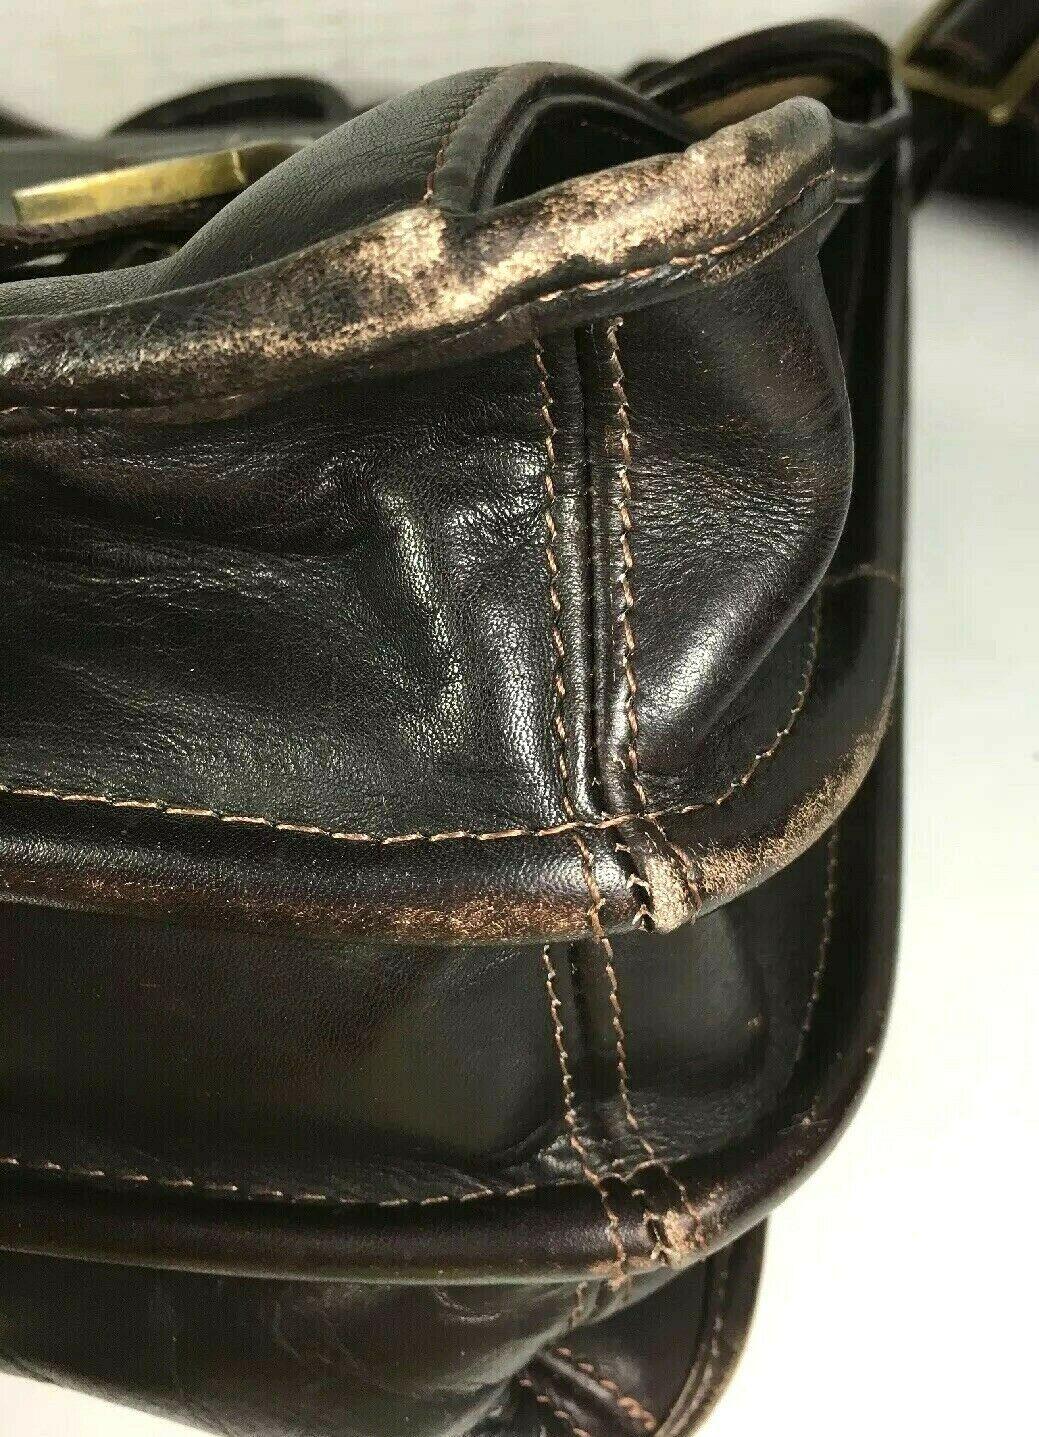 Santa Fe Dilana Vintage Dark Brown Leather Briefcase Laptop Bag – Distressed image 6